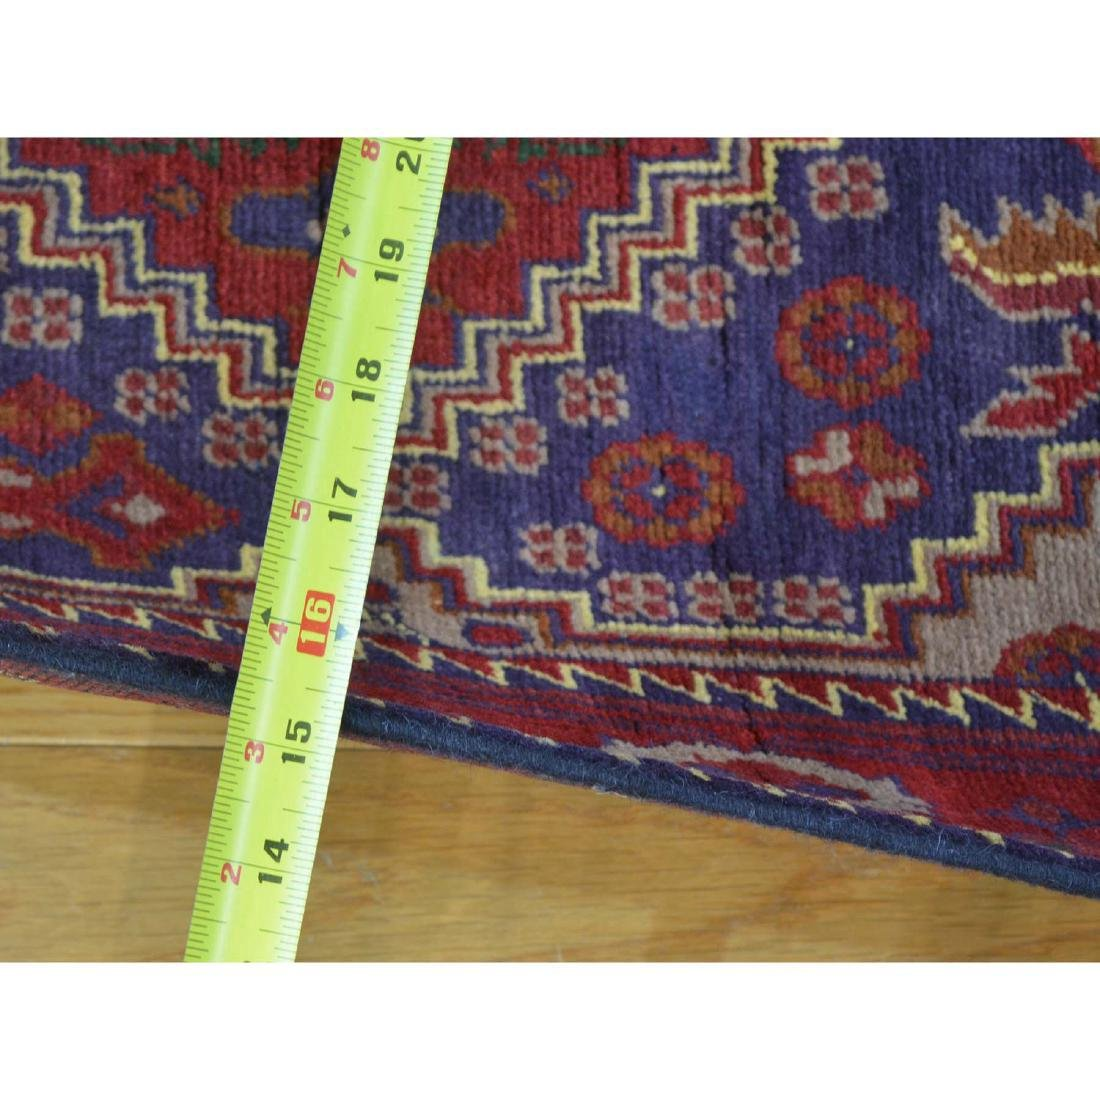 Runner Afghan Khamyab Handmade Rug 2.7x18.4 - 3